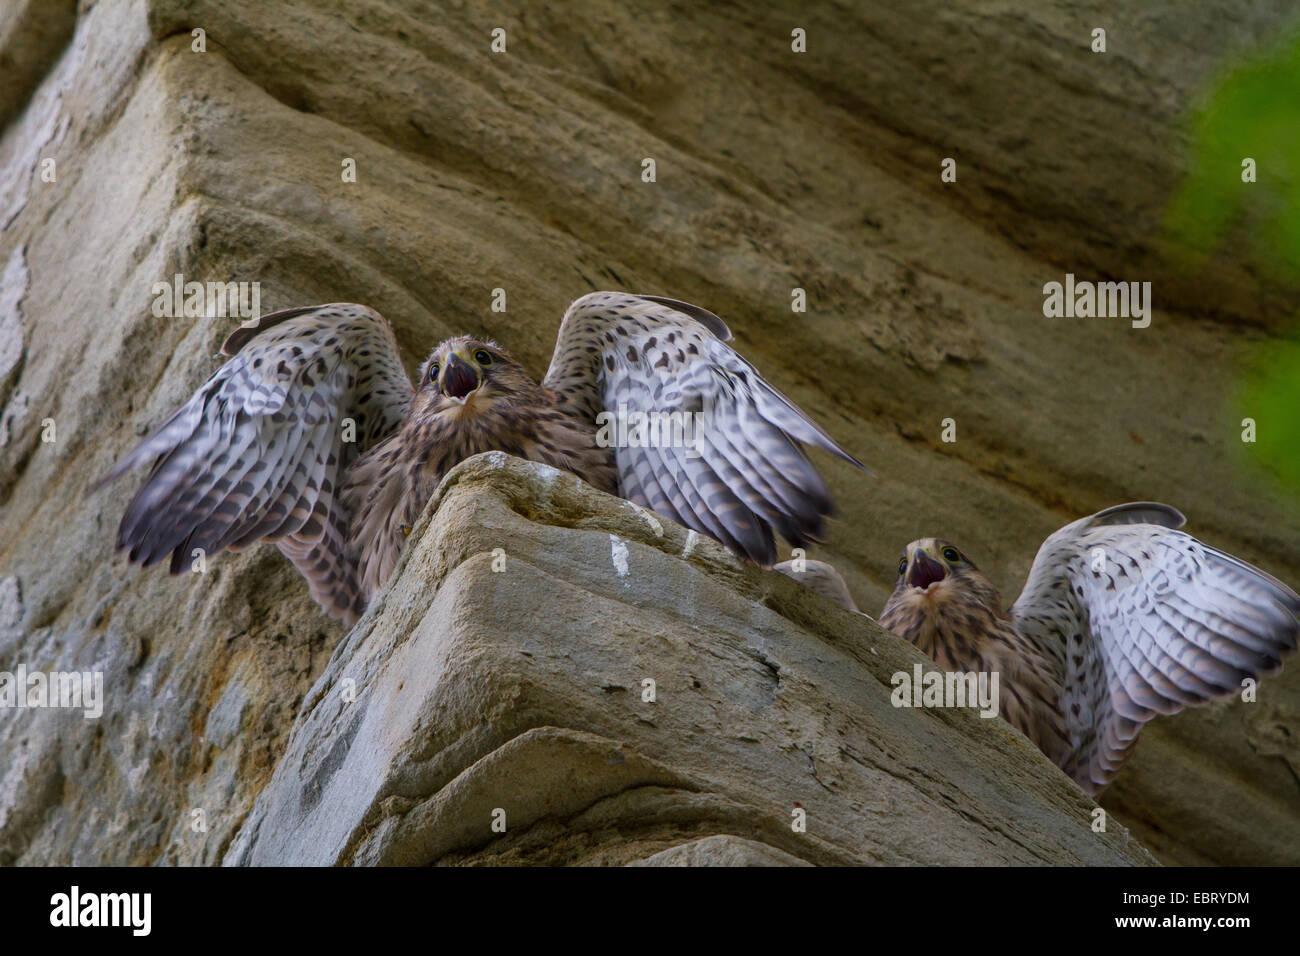 European Kestrel, Eurasian Kestrel, Old World Kestrel, Common Kestrel (Falco tinnunculus), two young kestrels beg - Stock Image